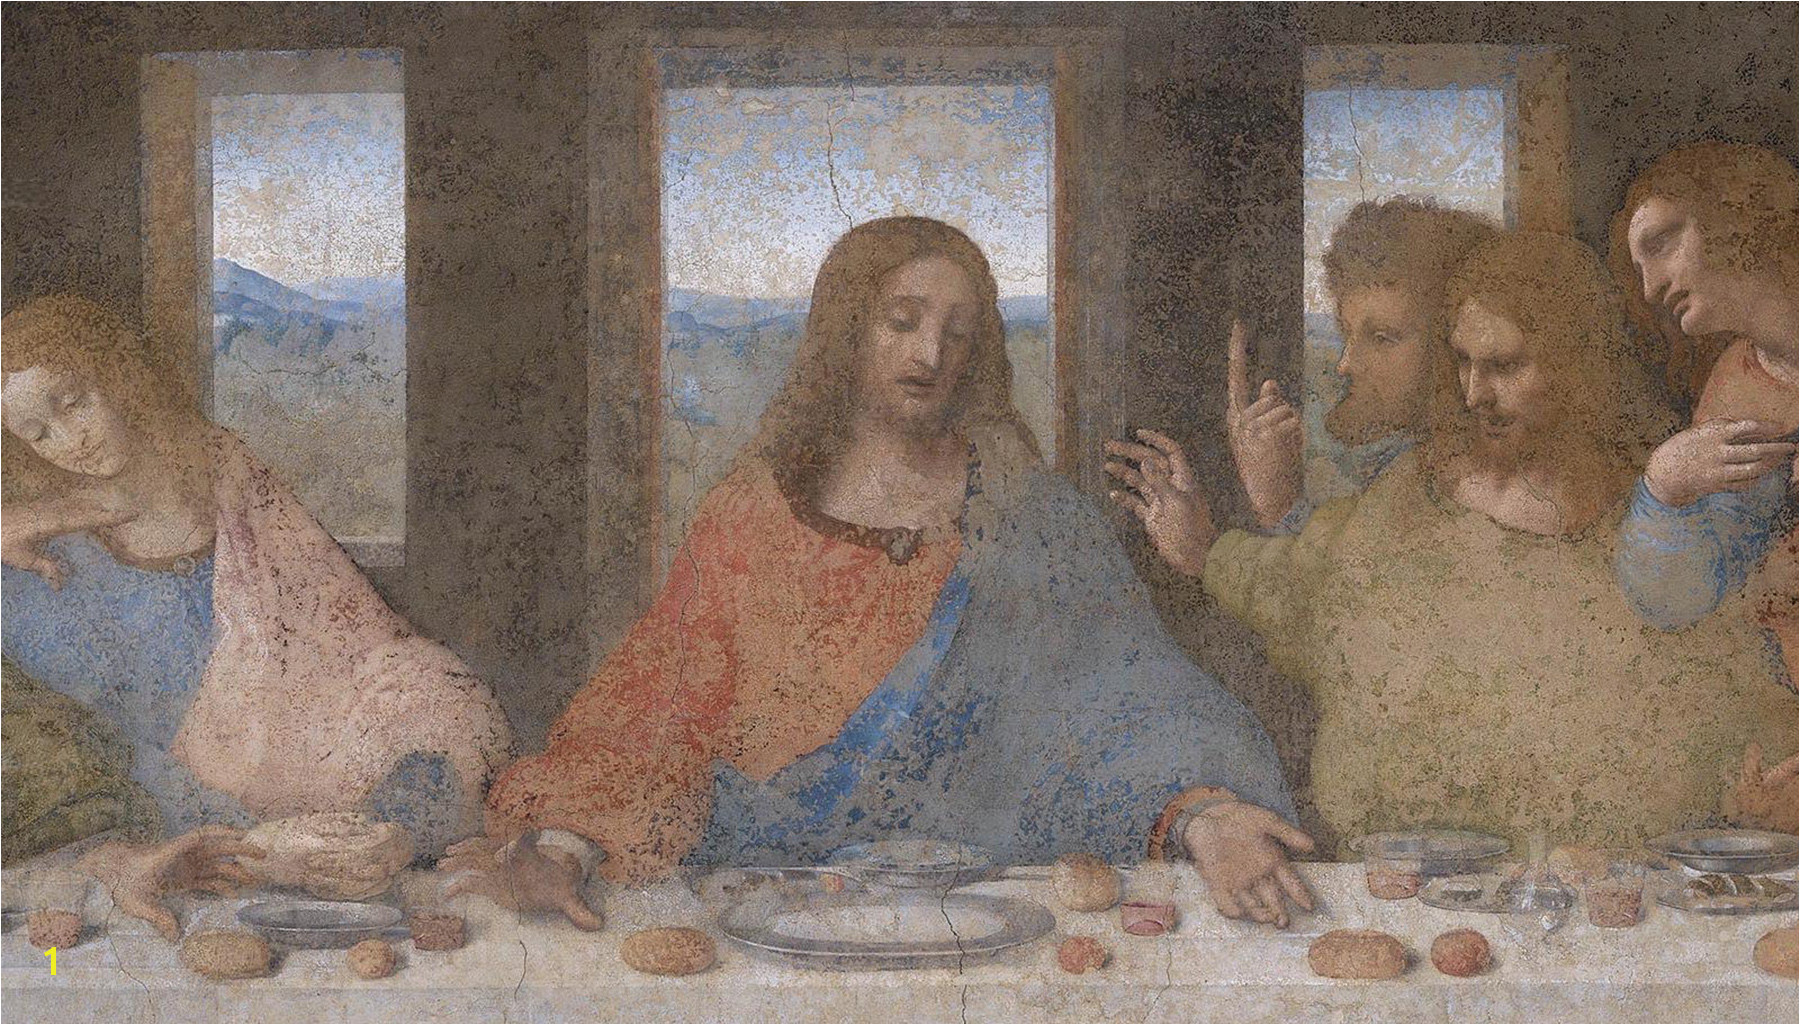 Lost Leonardo Da Vinci Mural Behind False Wall the Unending Fight to Preserve the Last Supper